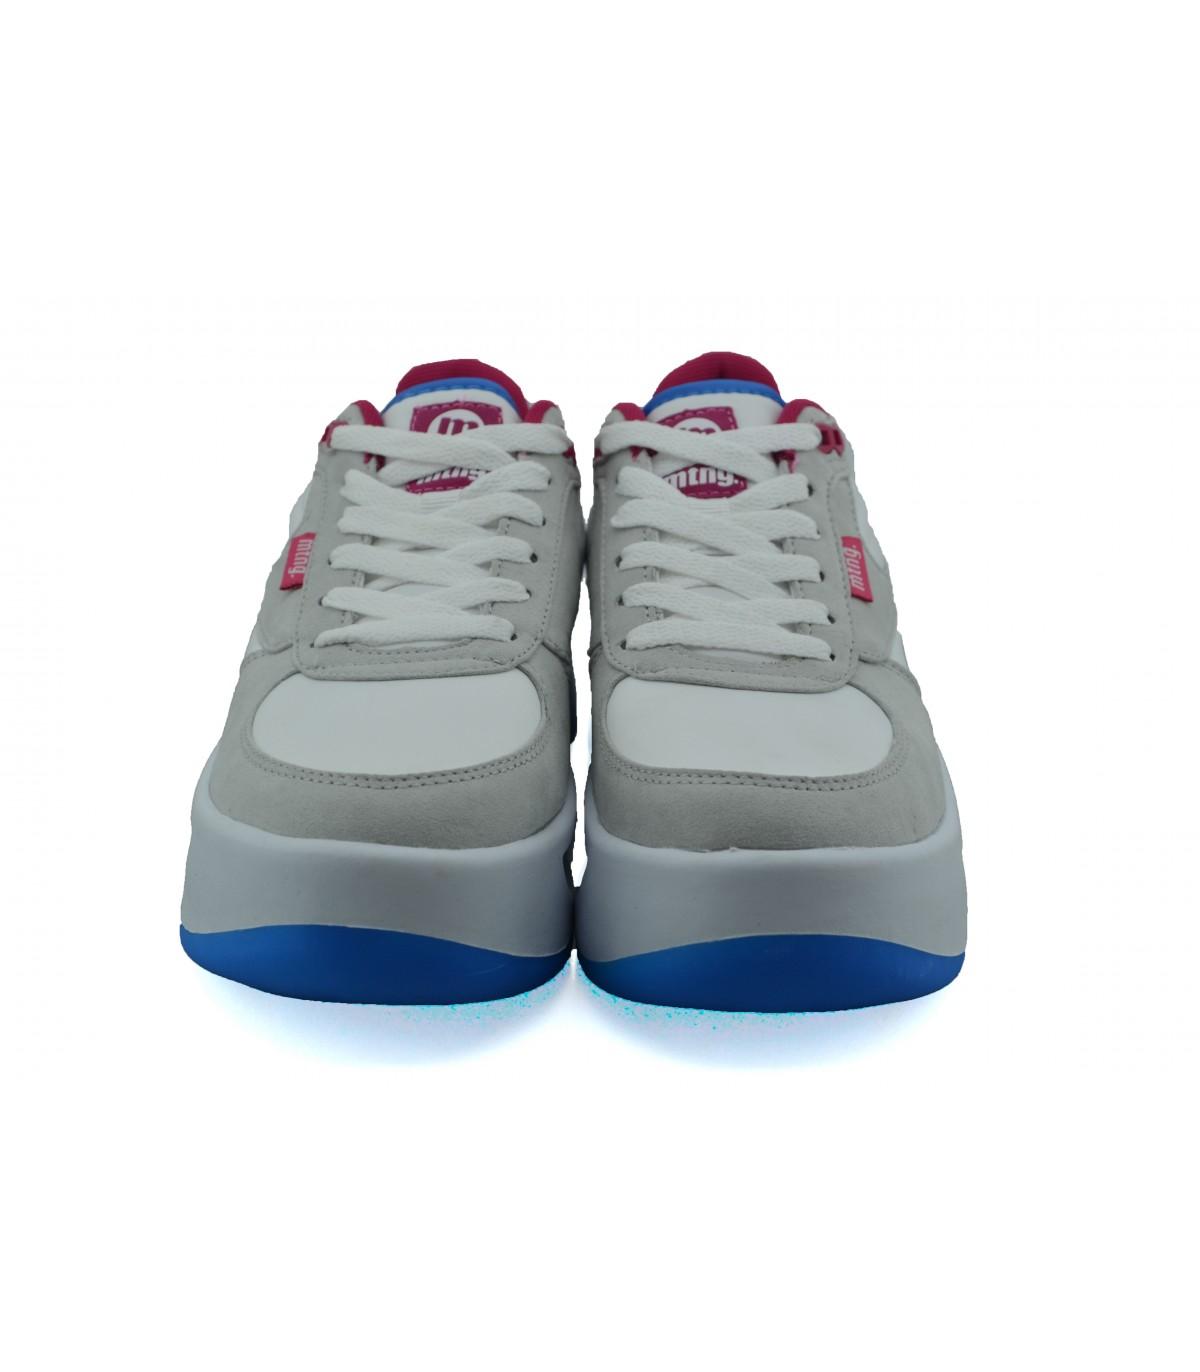 aa9aae5f4f2 Deportivas mujer MUSTANG Wal nylon | Zapatos Online | Calzado Mujer